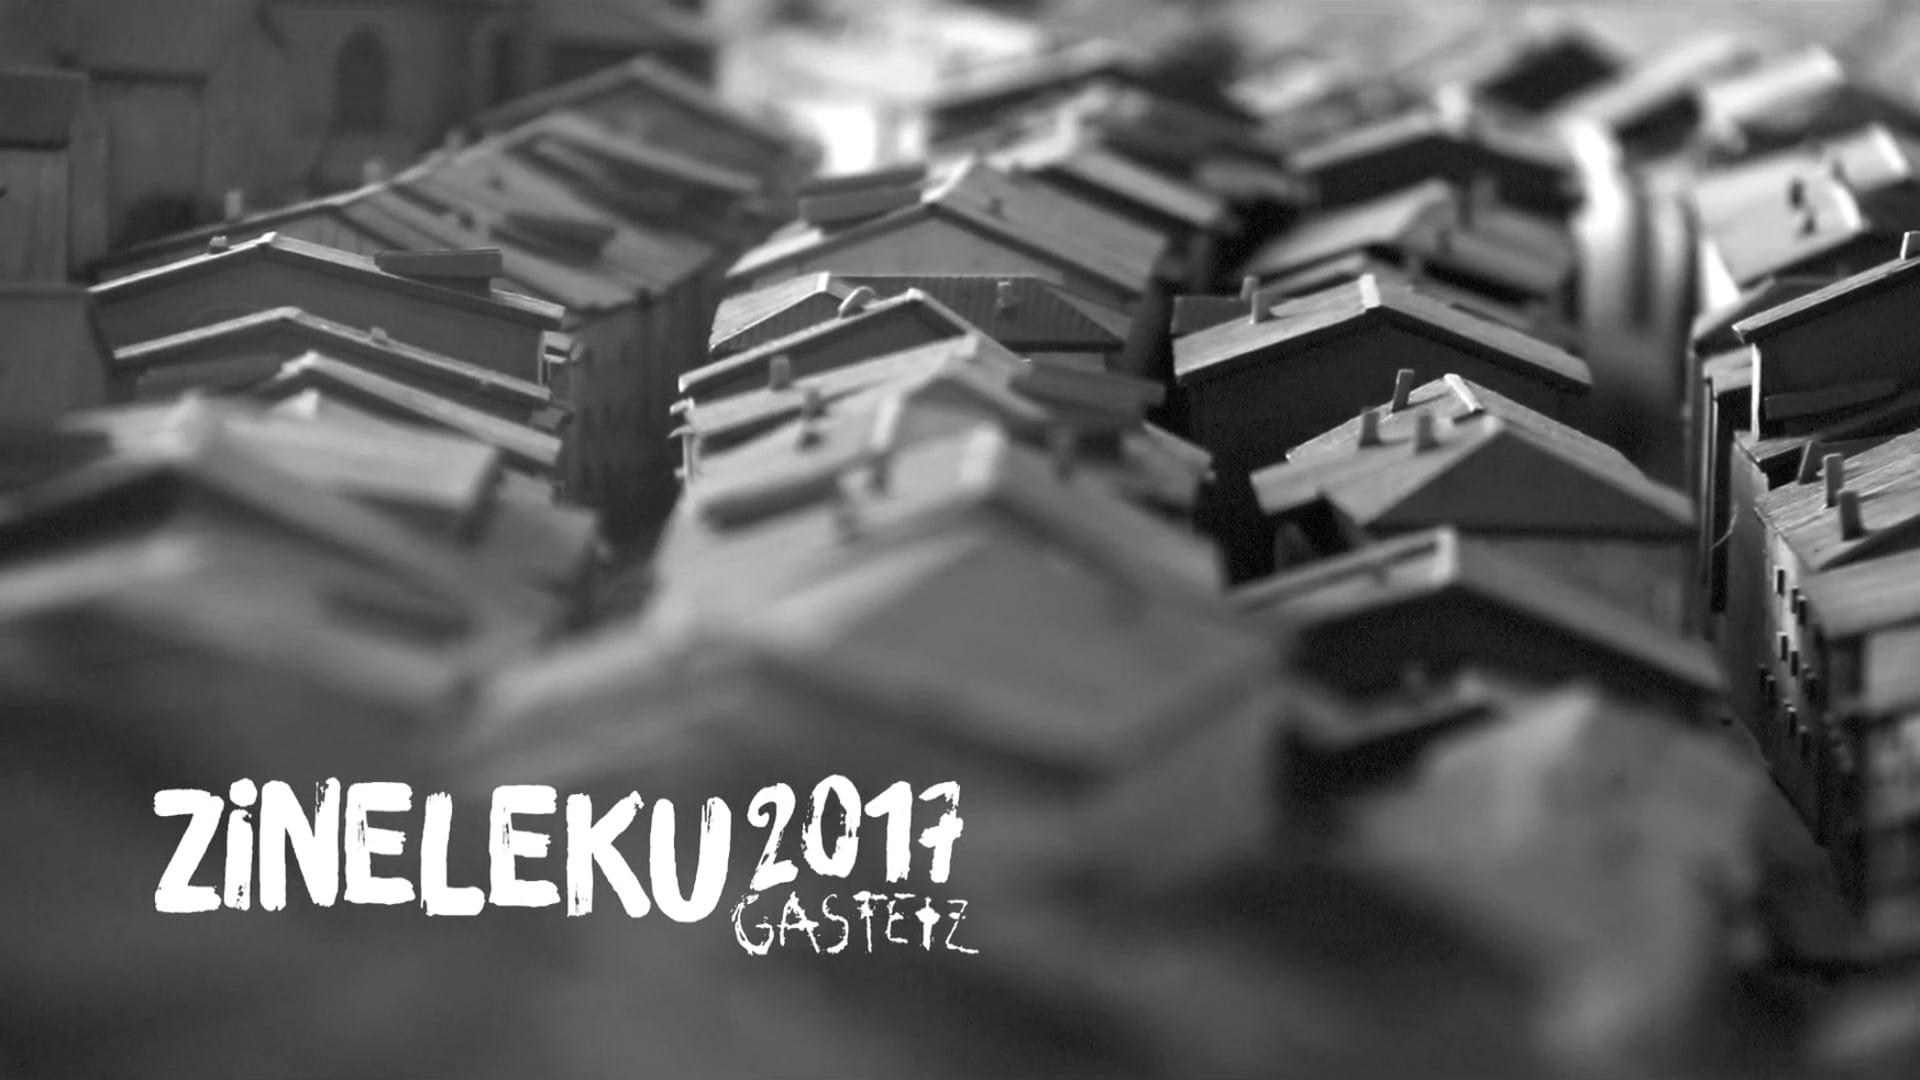 Zineleku 2017 (Memoria)